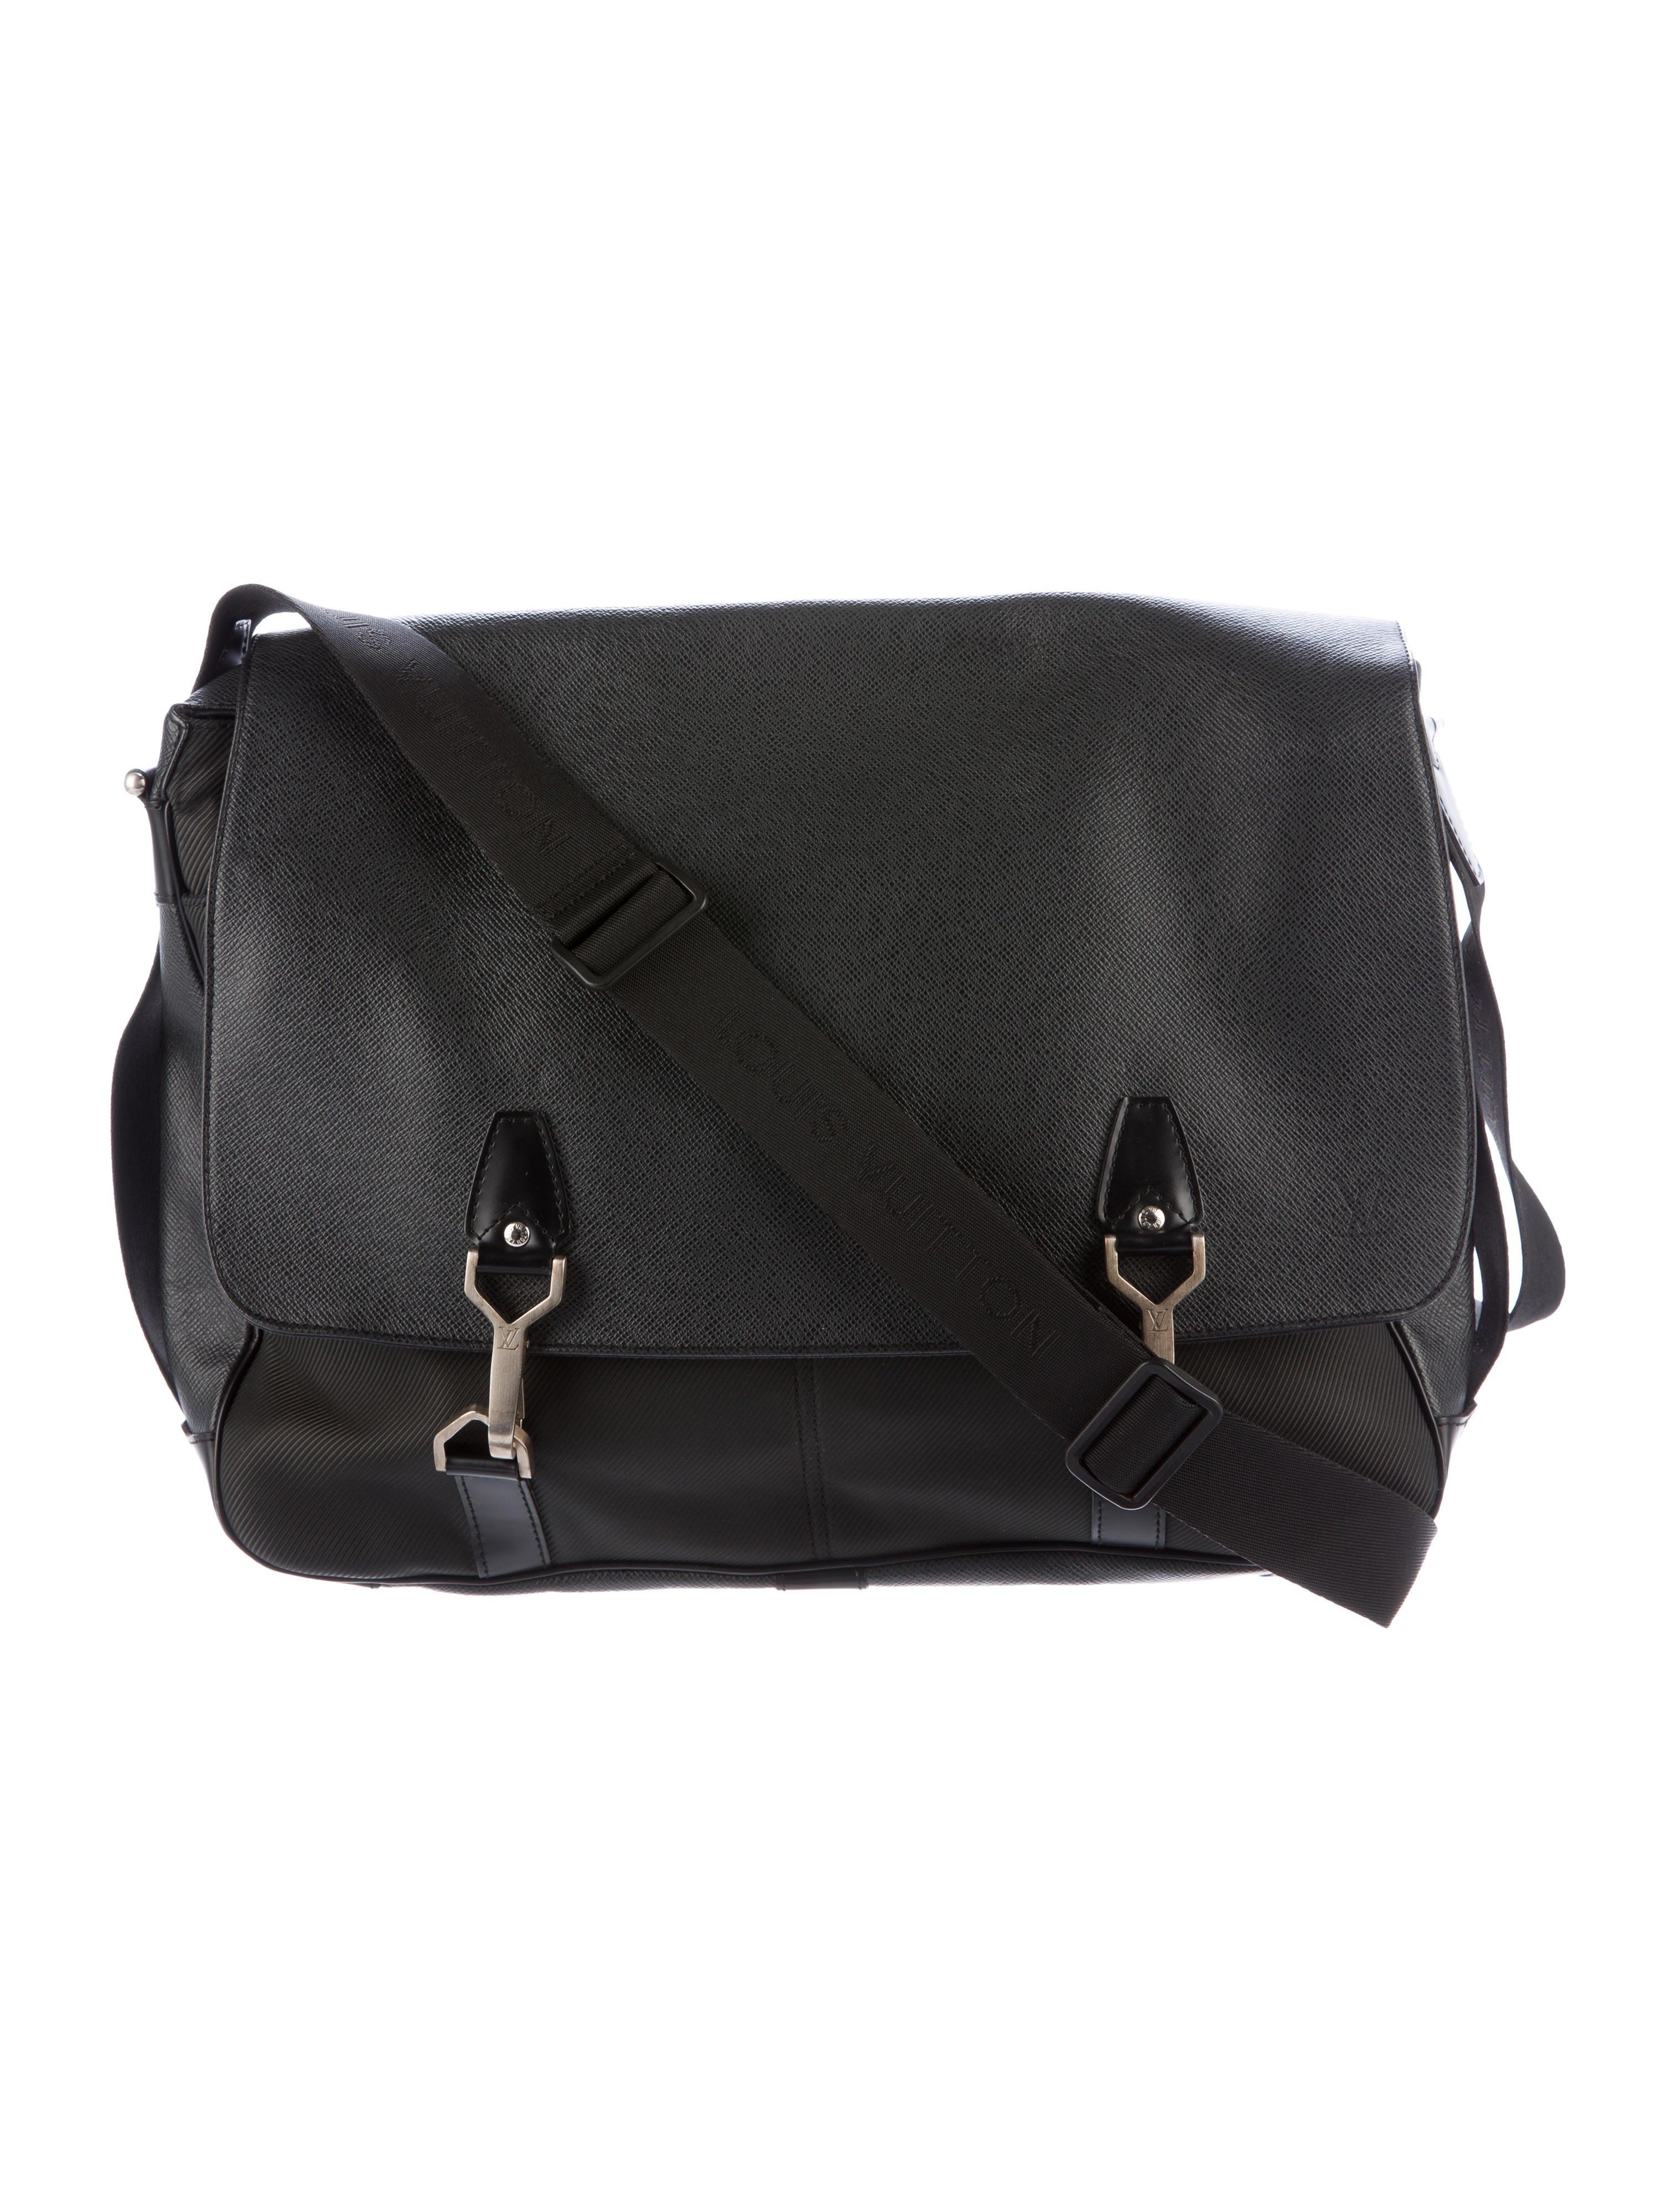 1cd344af6433 Louis Vuitton Taiga Dersou Messenger Bag - Bags - LOU102130